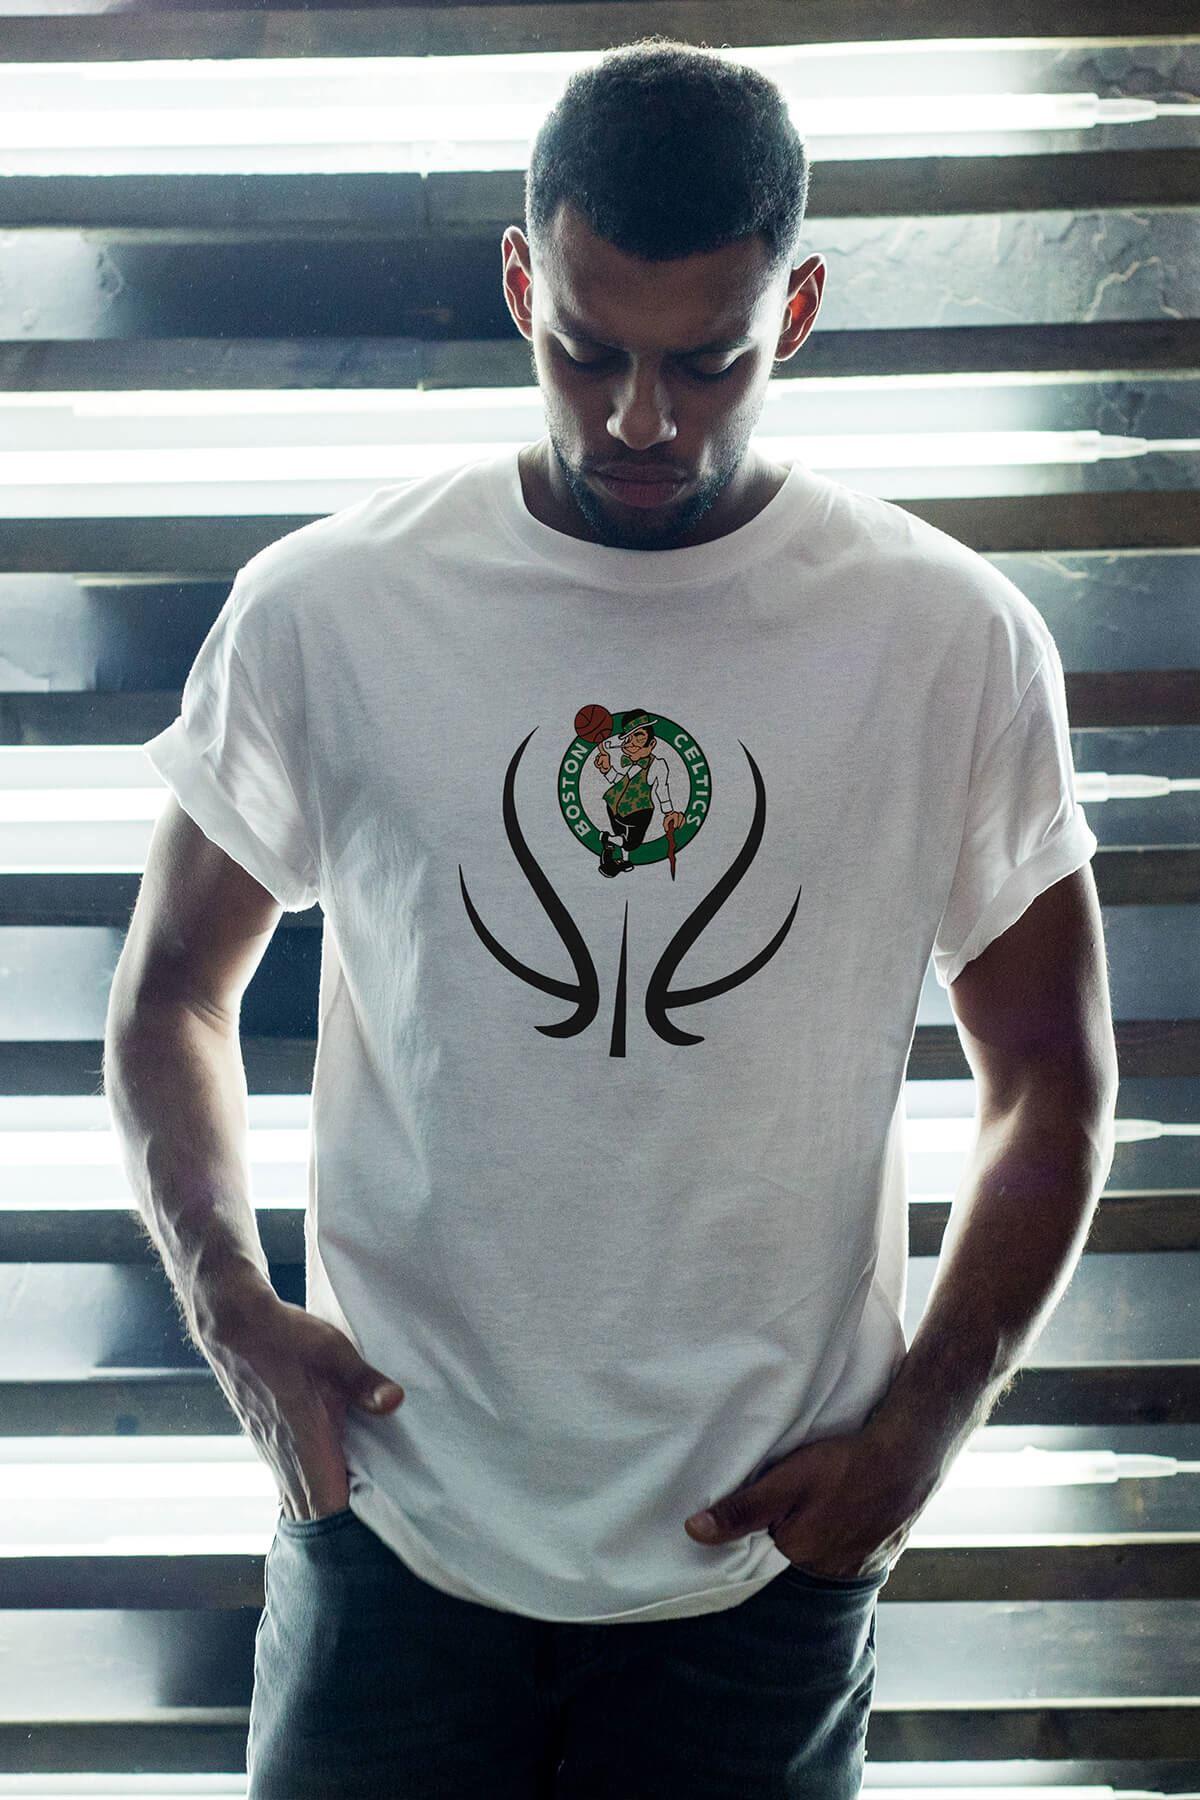 Boston Celtics 29 Beyaz Erkek Oversize Tshirt - Tişört